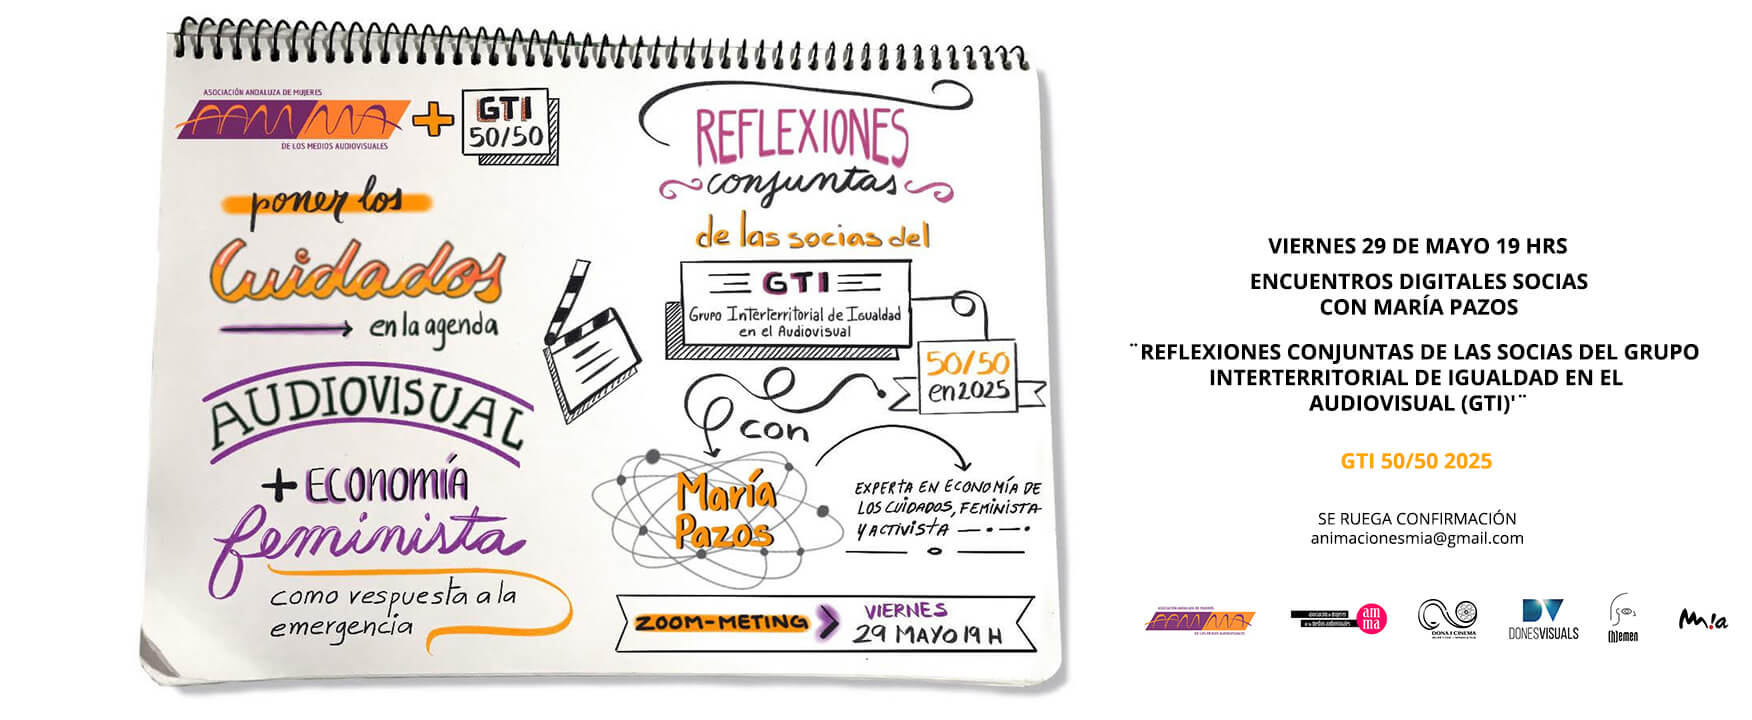 Encuentro Digital 29 Mayo